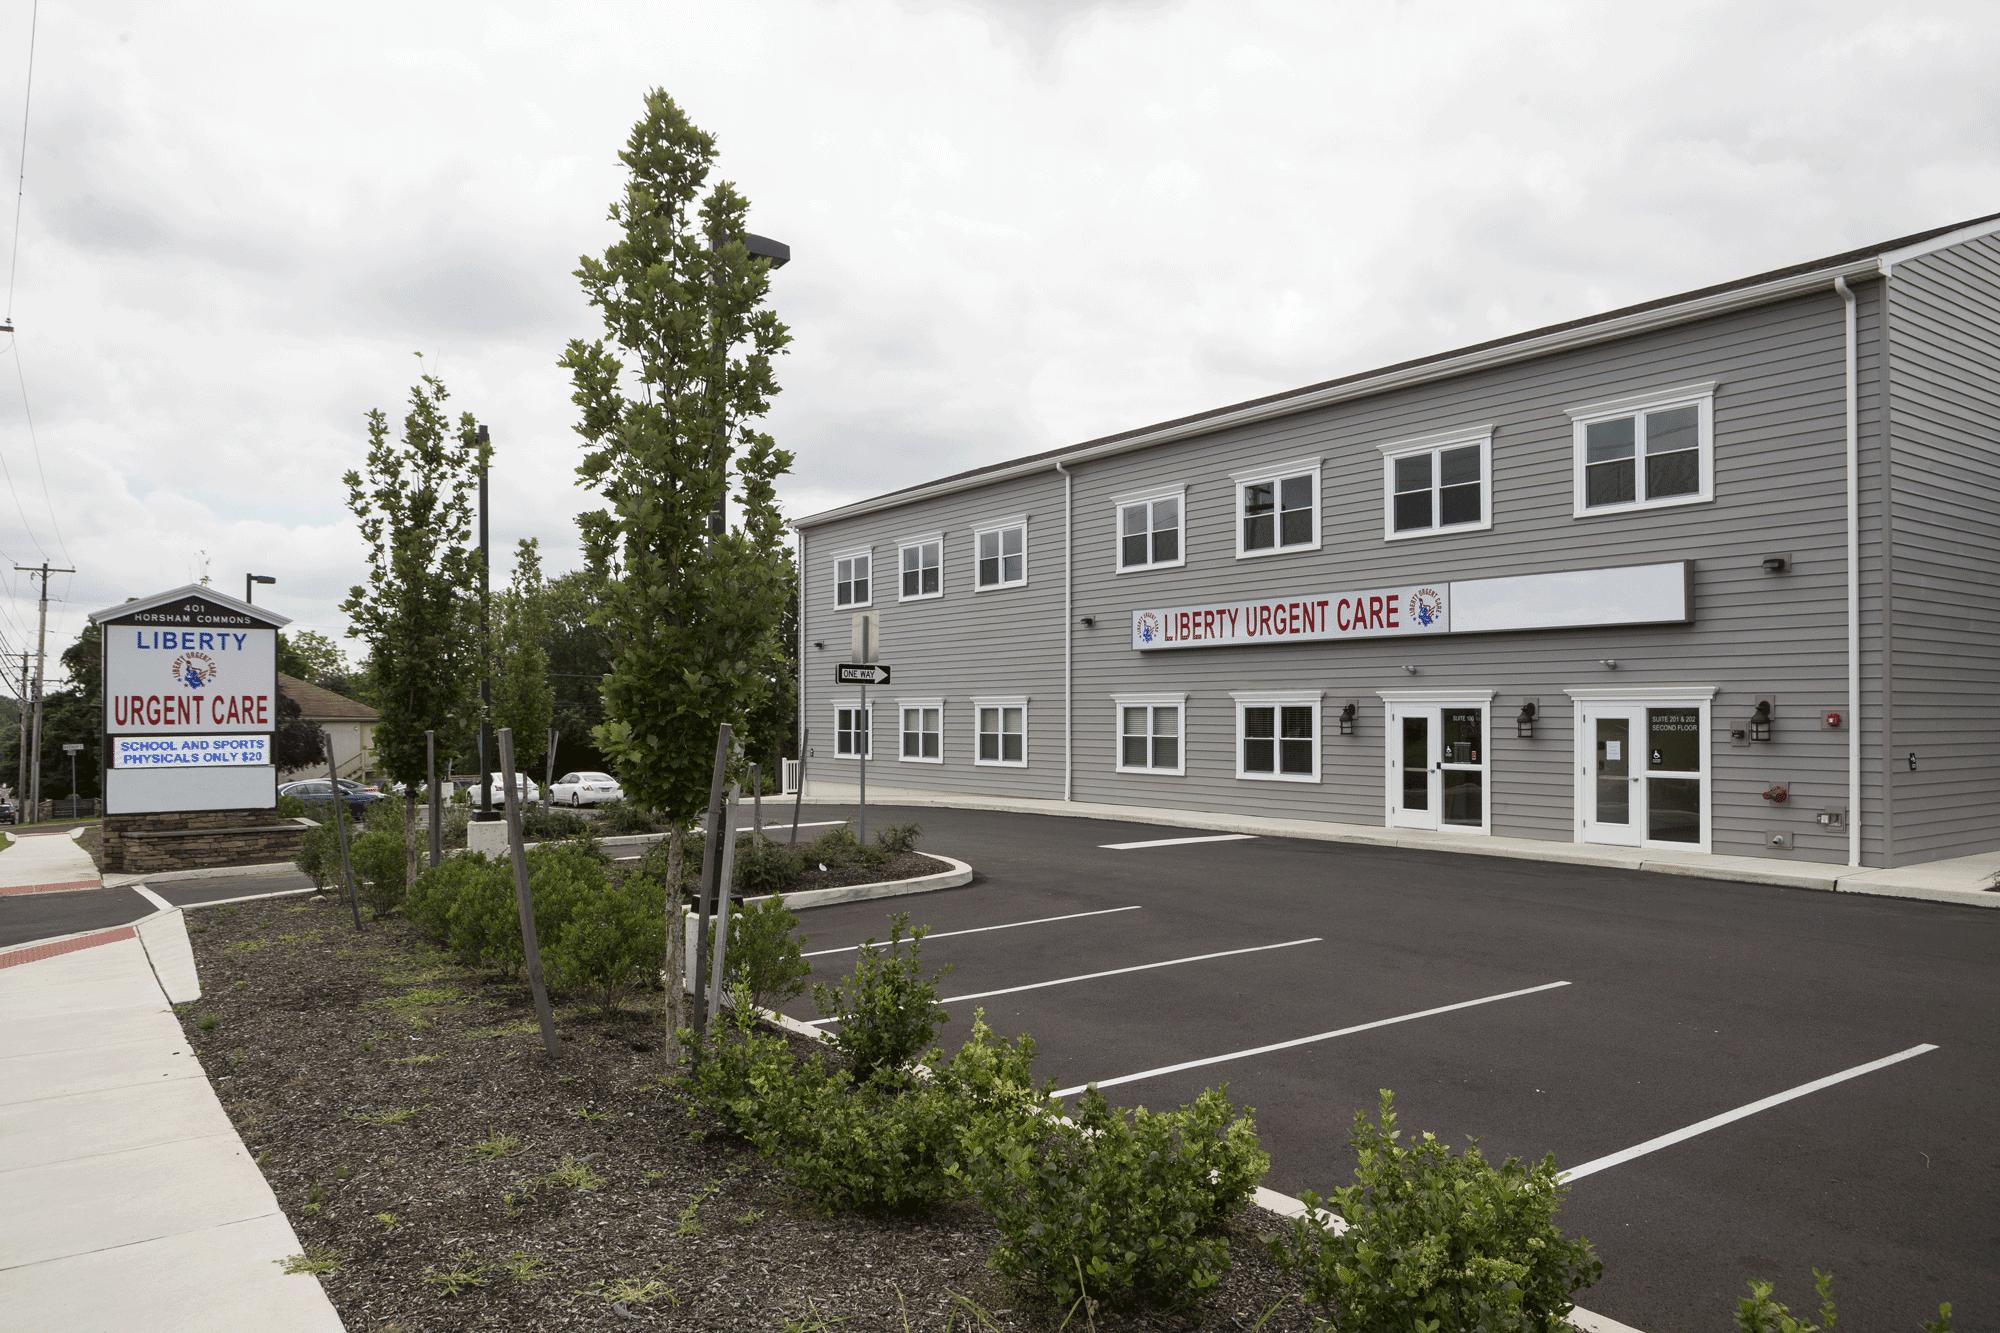 Liberty Urgent Care in Horsham, PA - building exterior